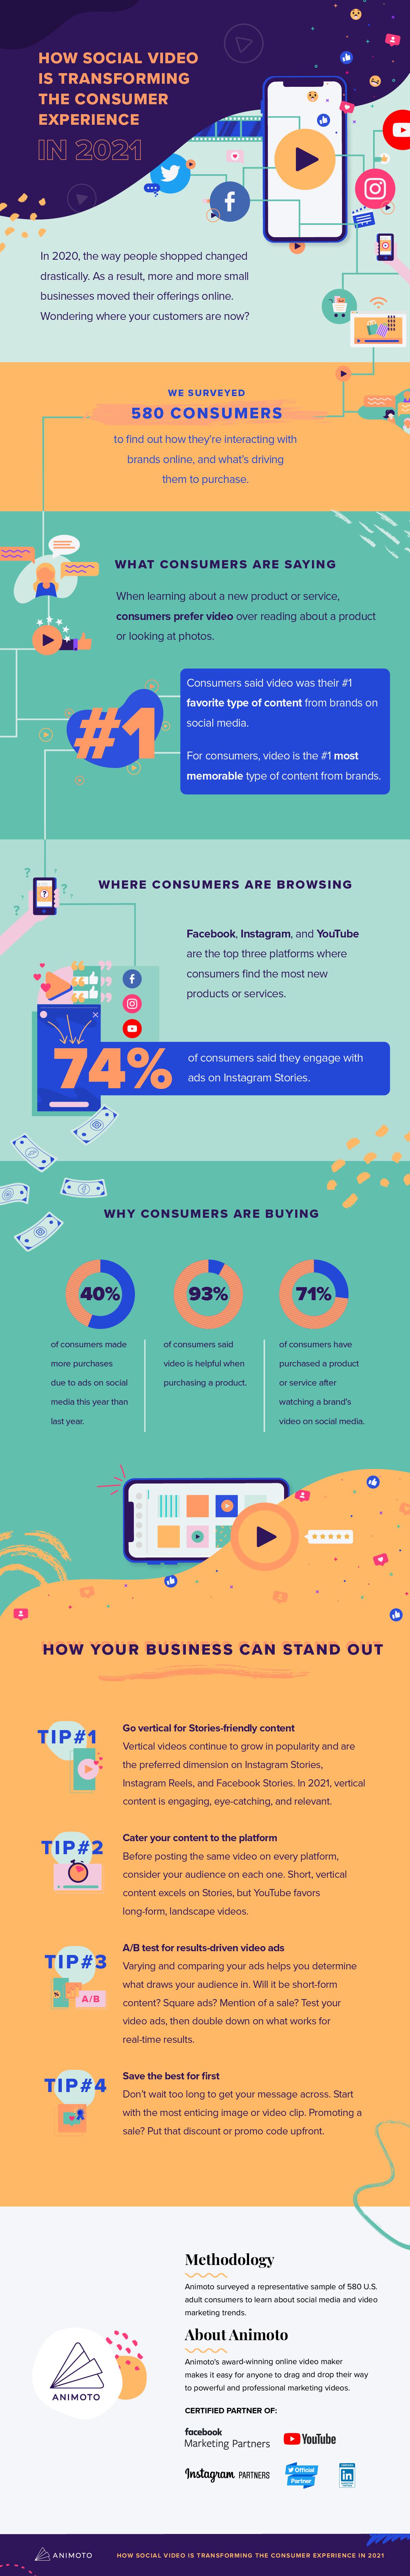 2021-03 SocialVideoTrends-ConsumerInsights Infographic Infographic (1)